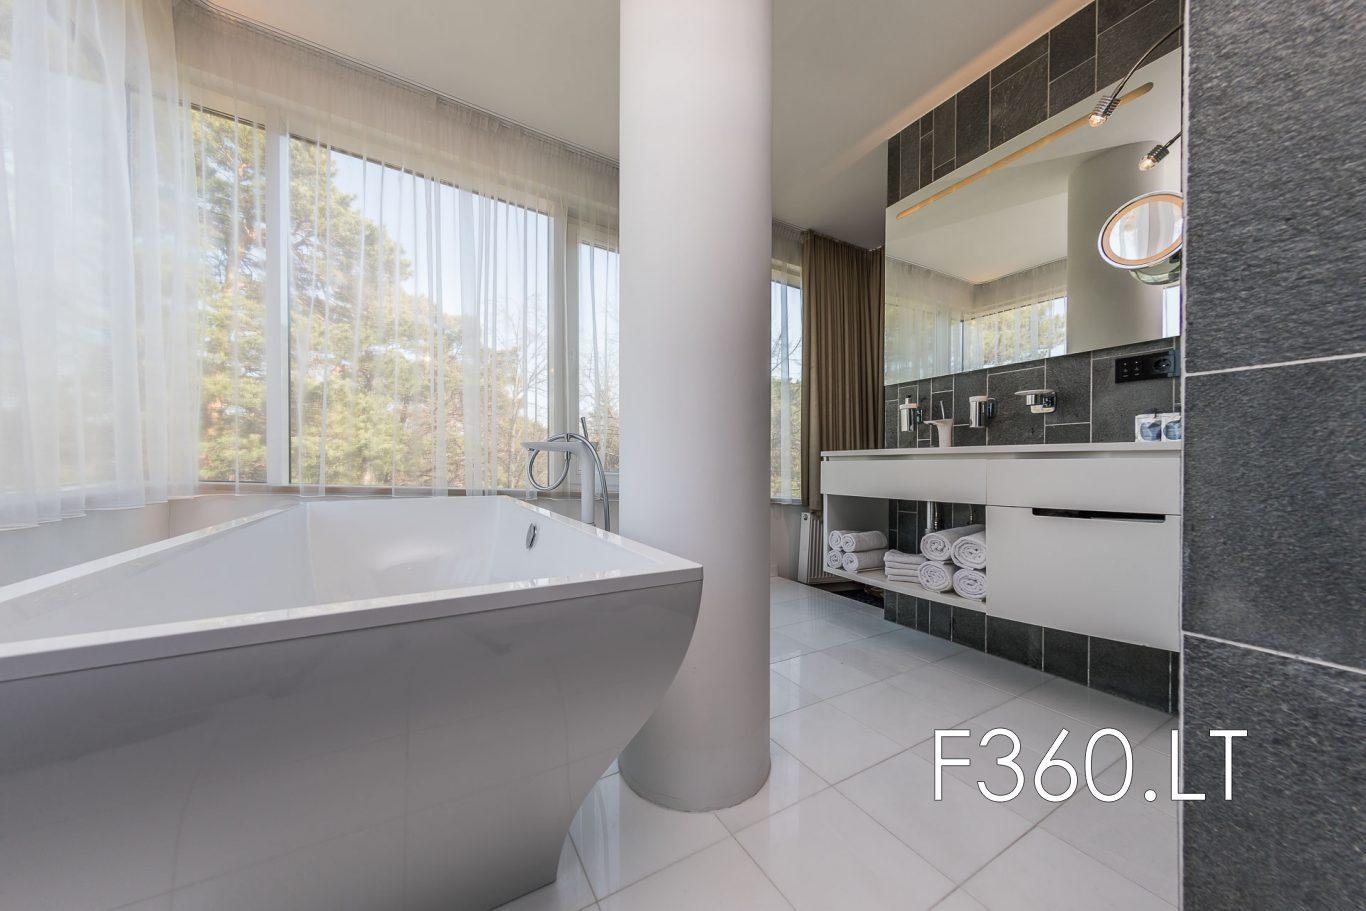 Vs039 Palanga Spa Design Hotel, Palanga Fotografavimas Interjeru F360 Lt 3t4a3337